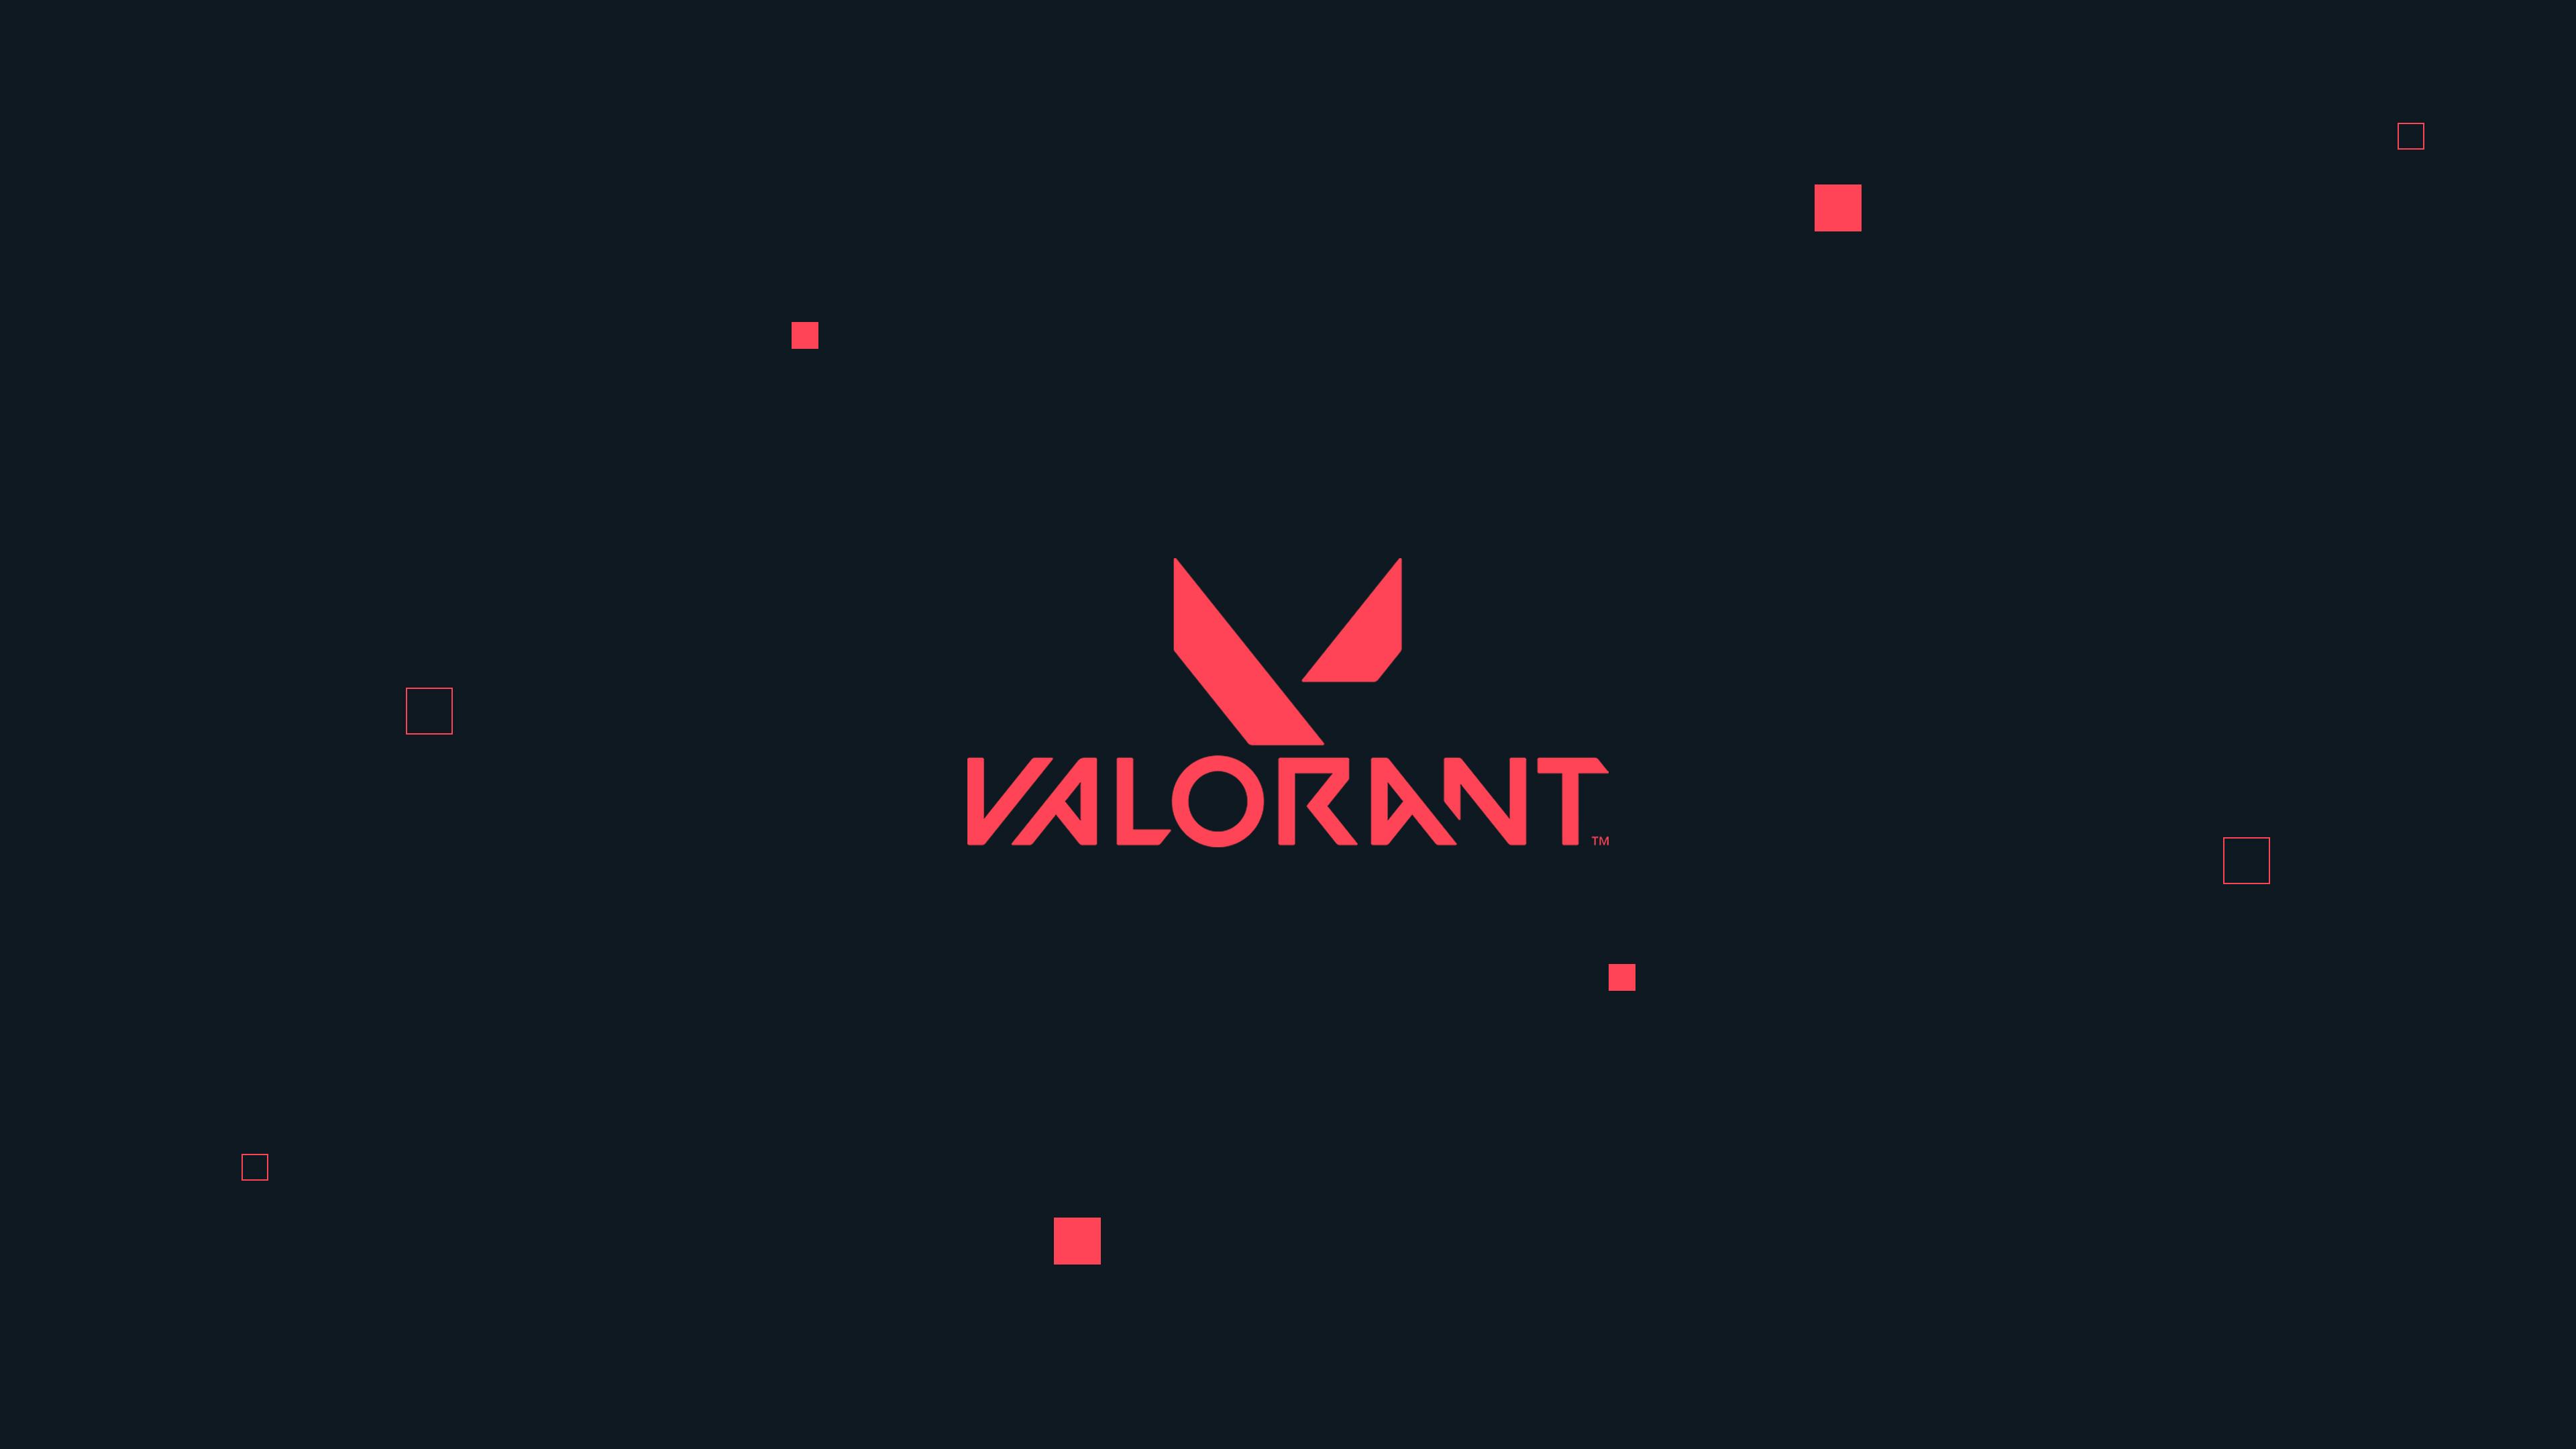 Fondos de pantalla Valorant Logo